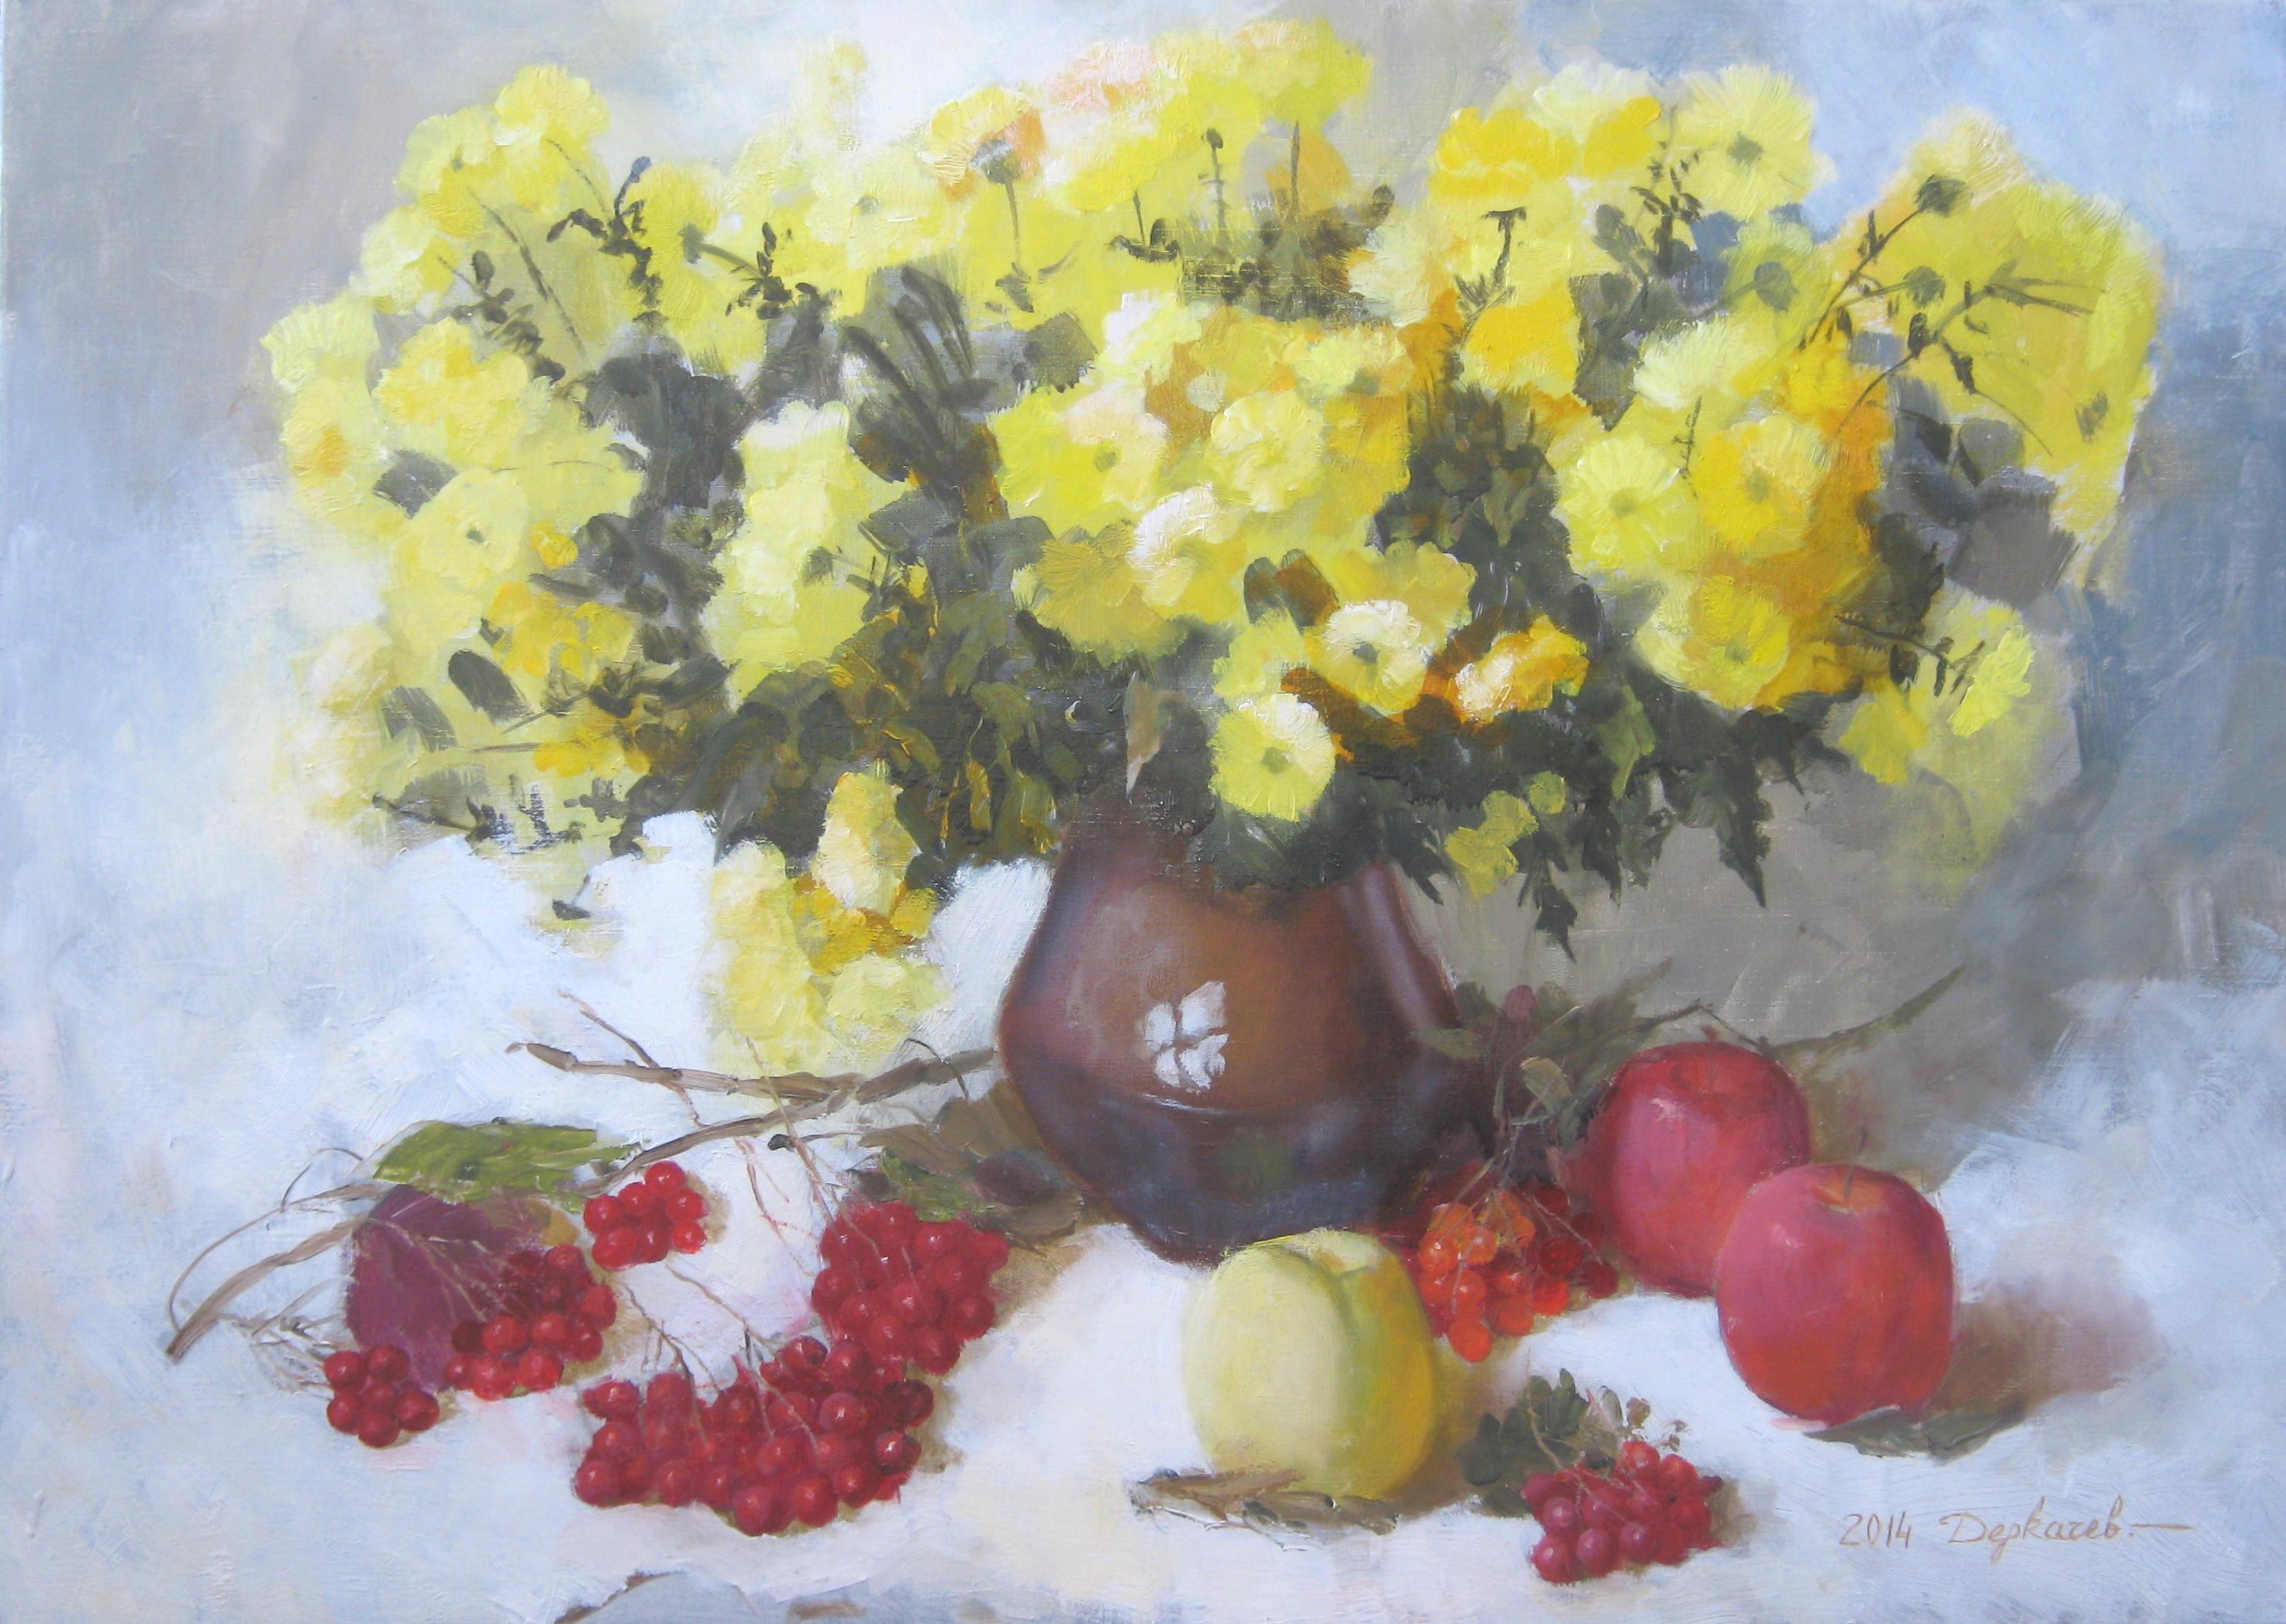 Желтые хризантемы, калина, яблоки